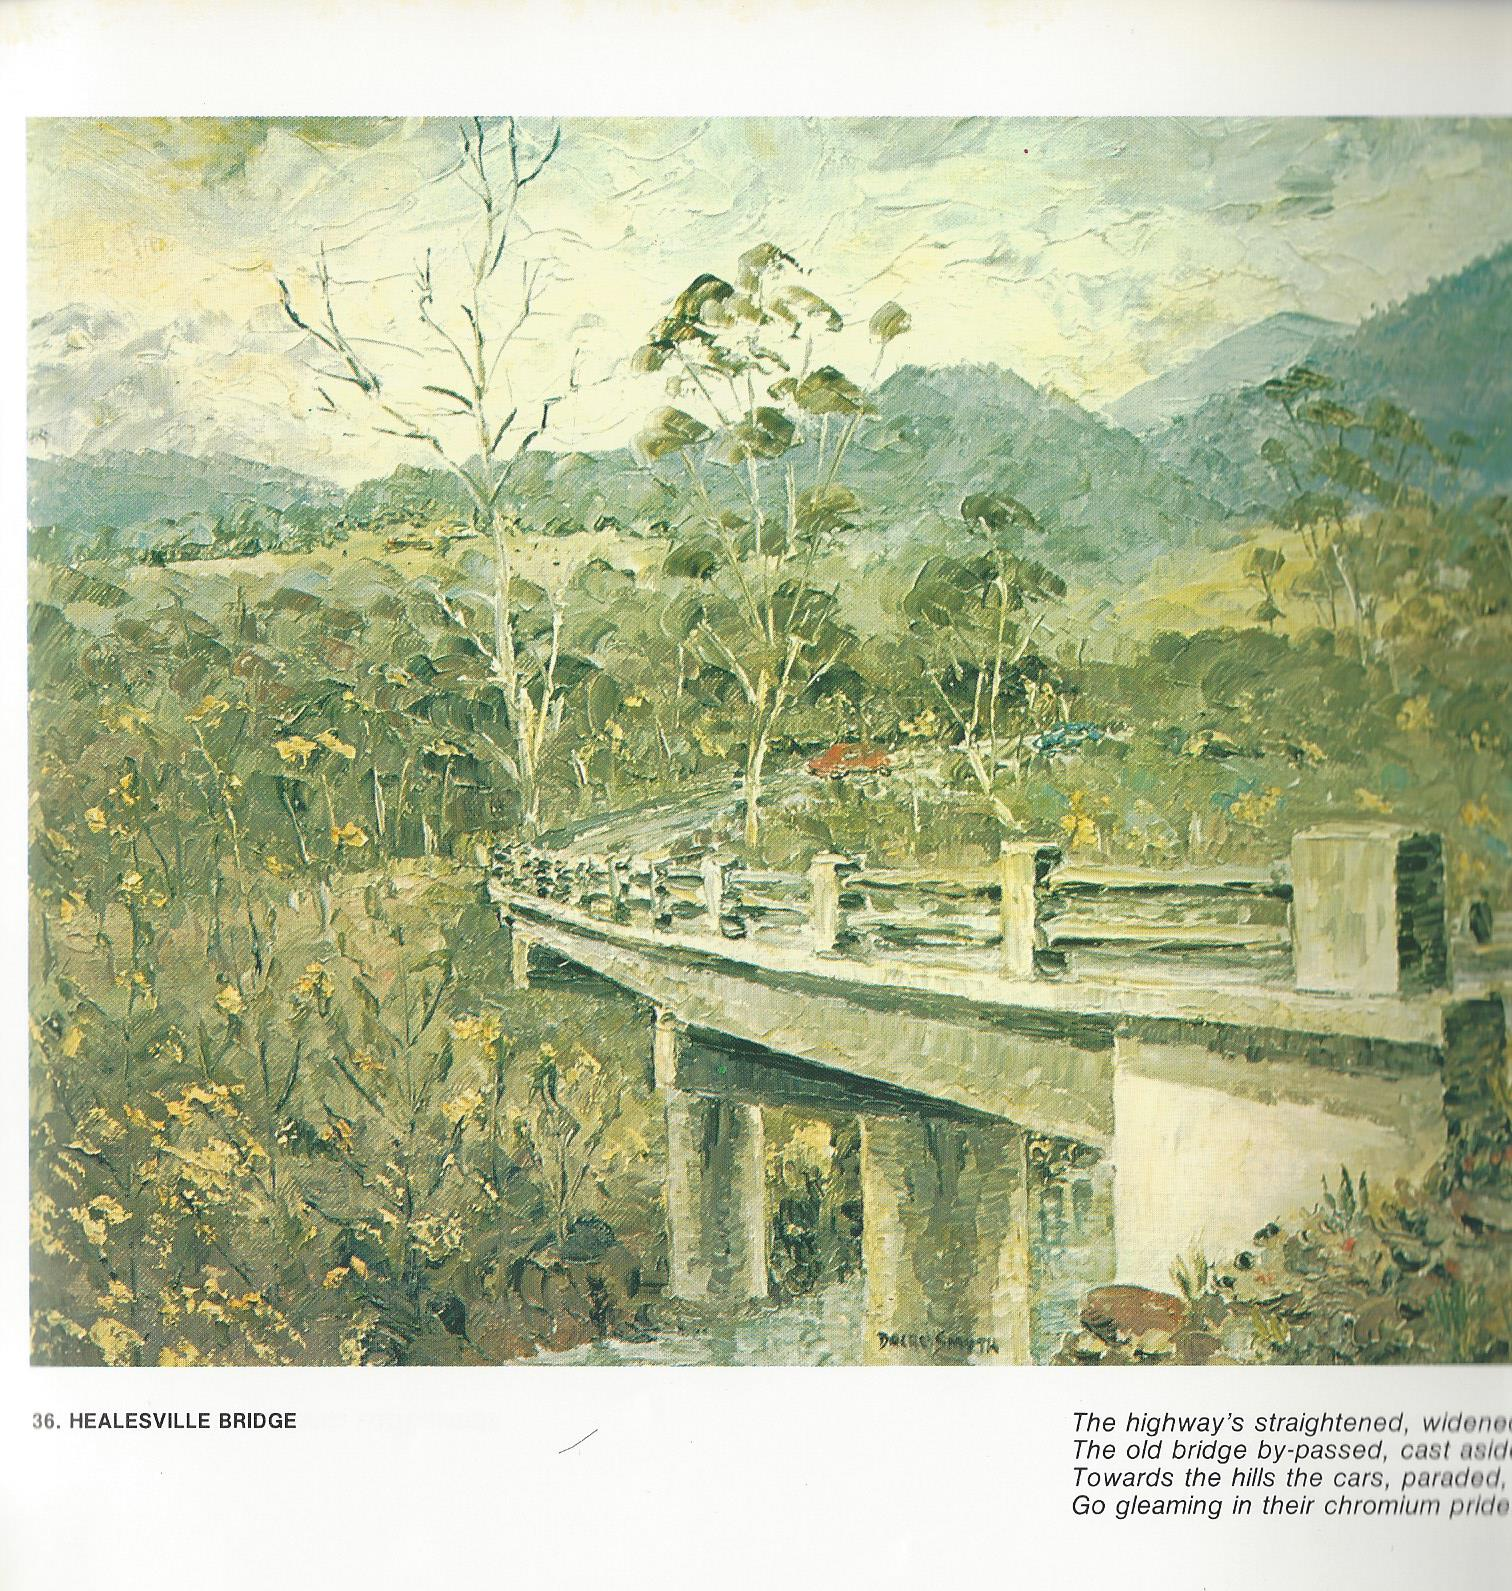 36. Healesville Bridge